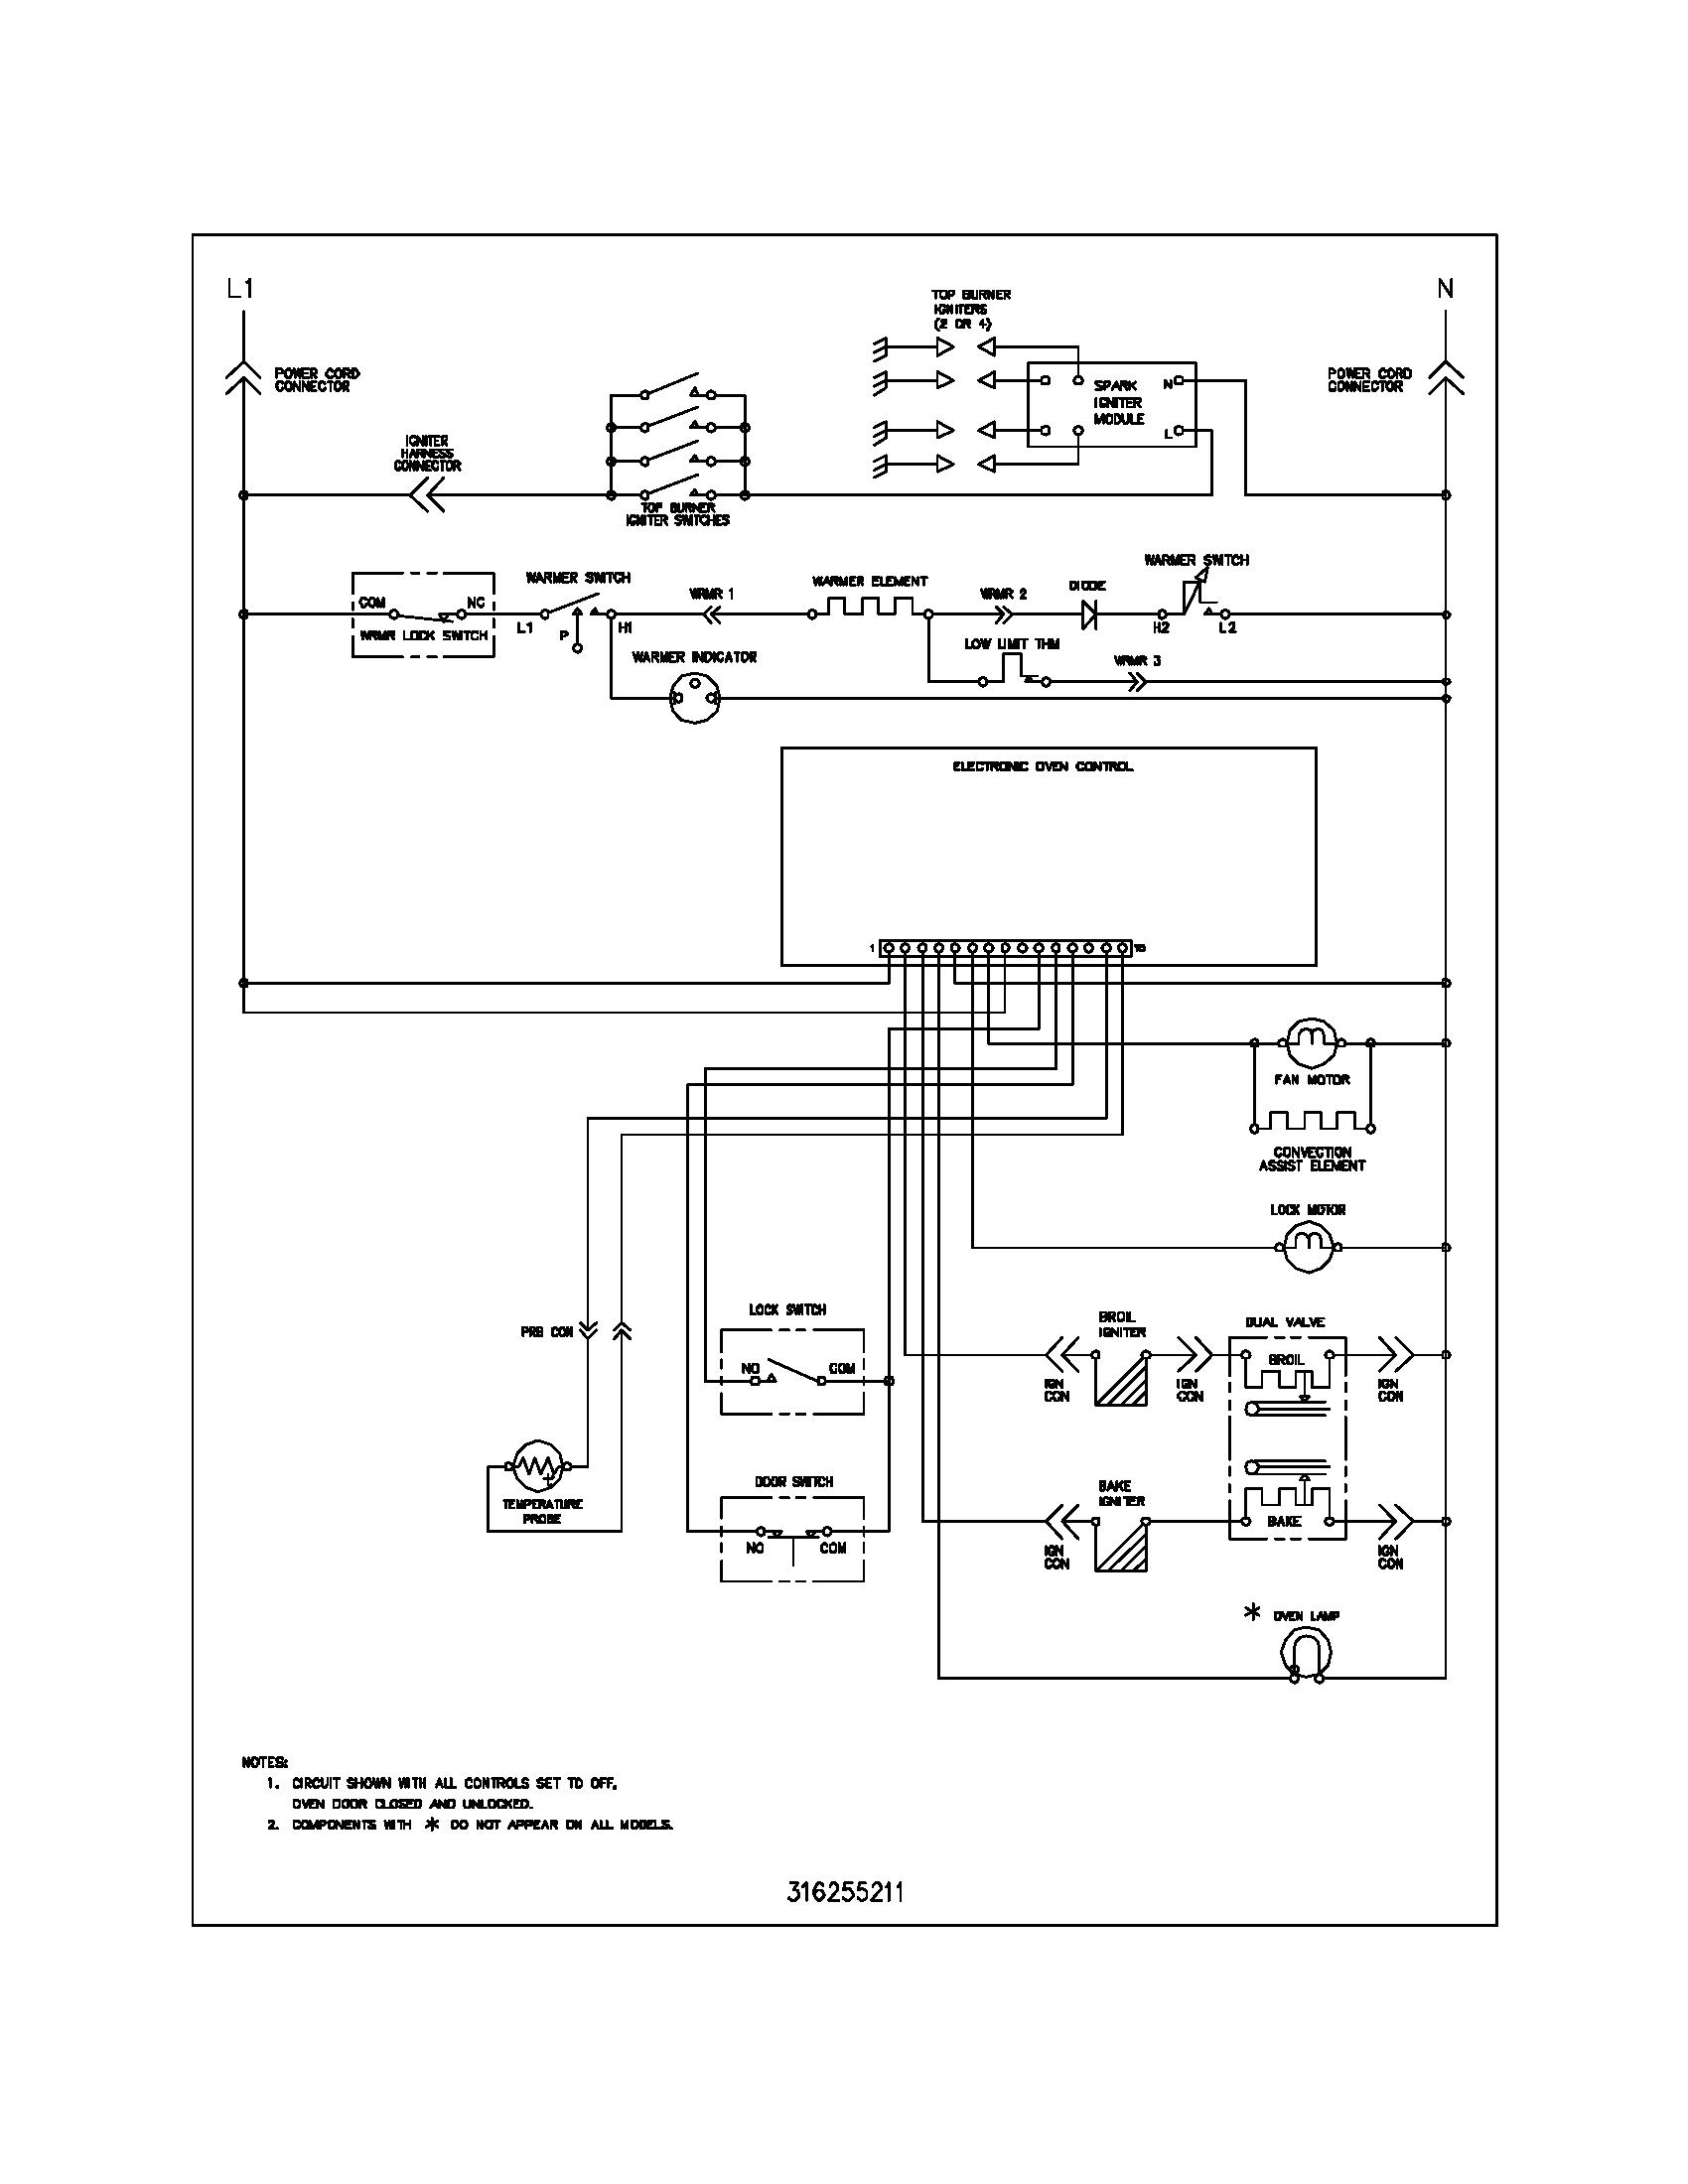 Furnace Wiring Diagram Eb15b Electric Arresting